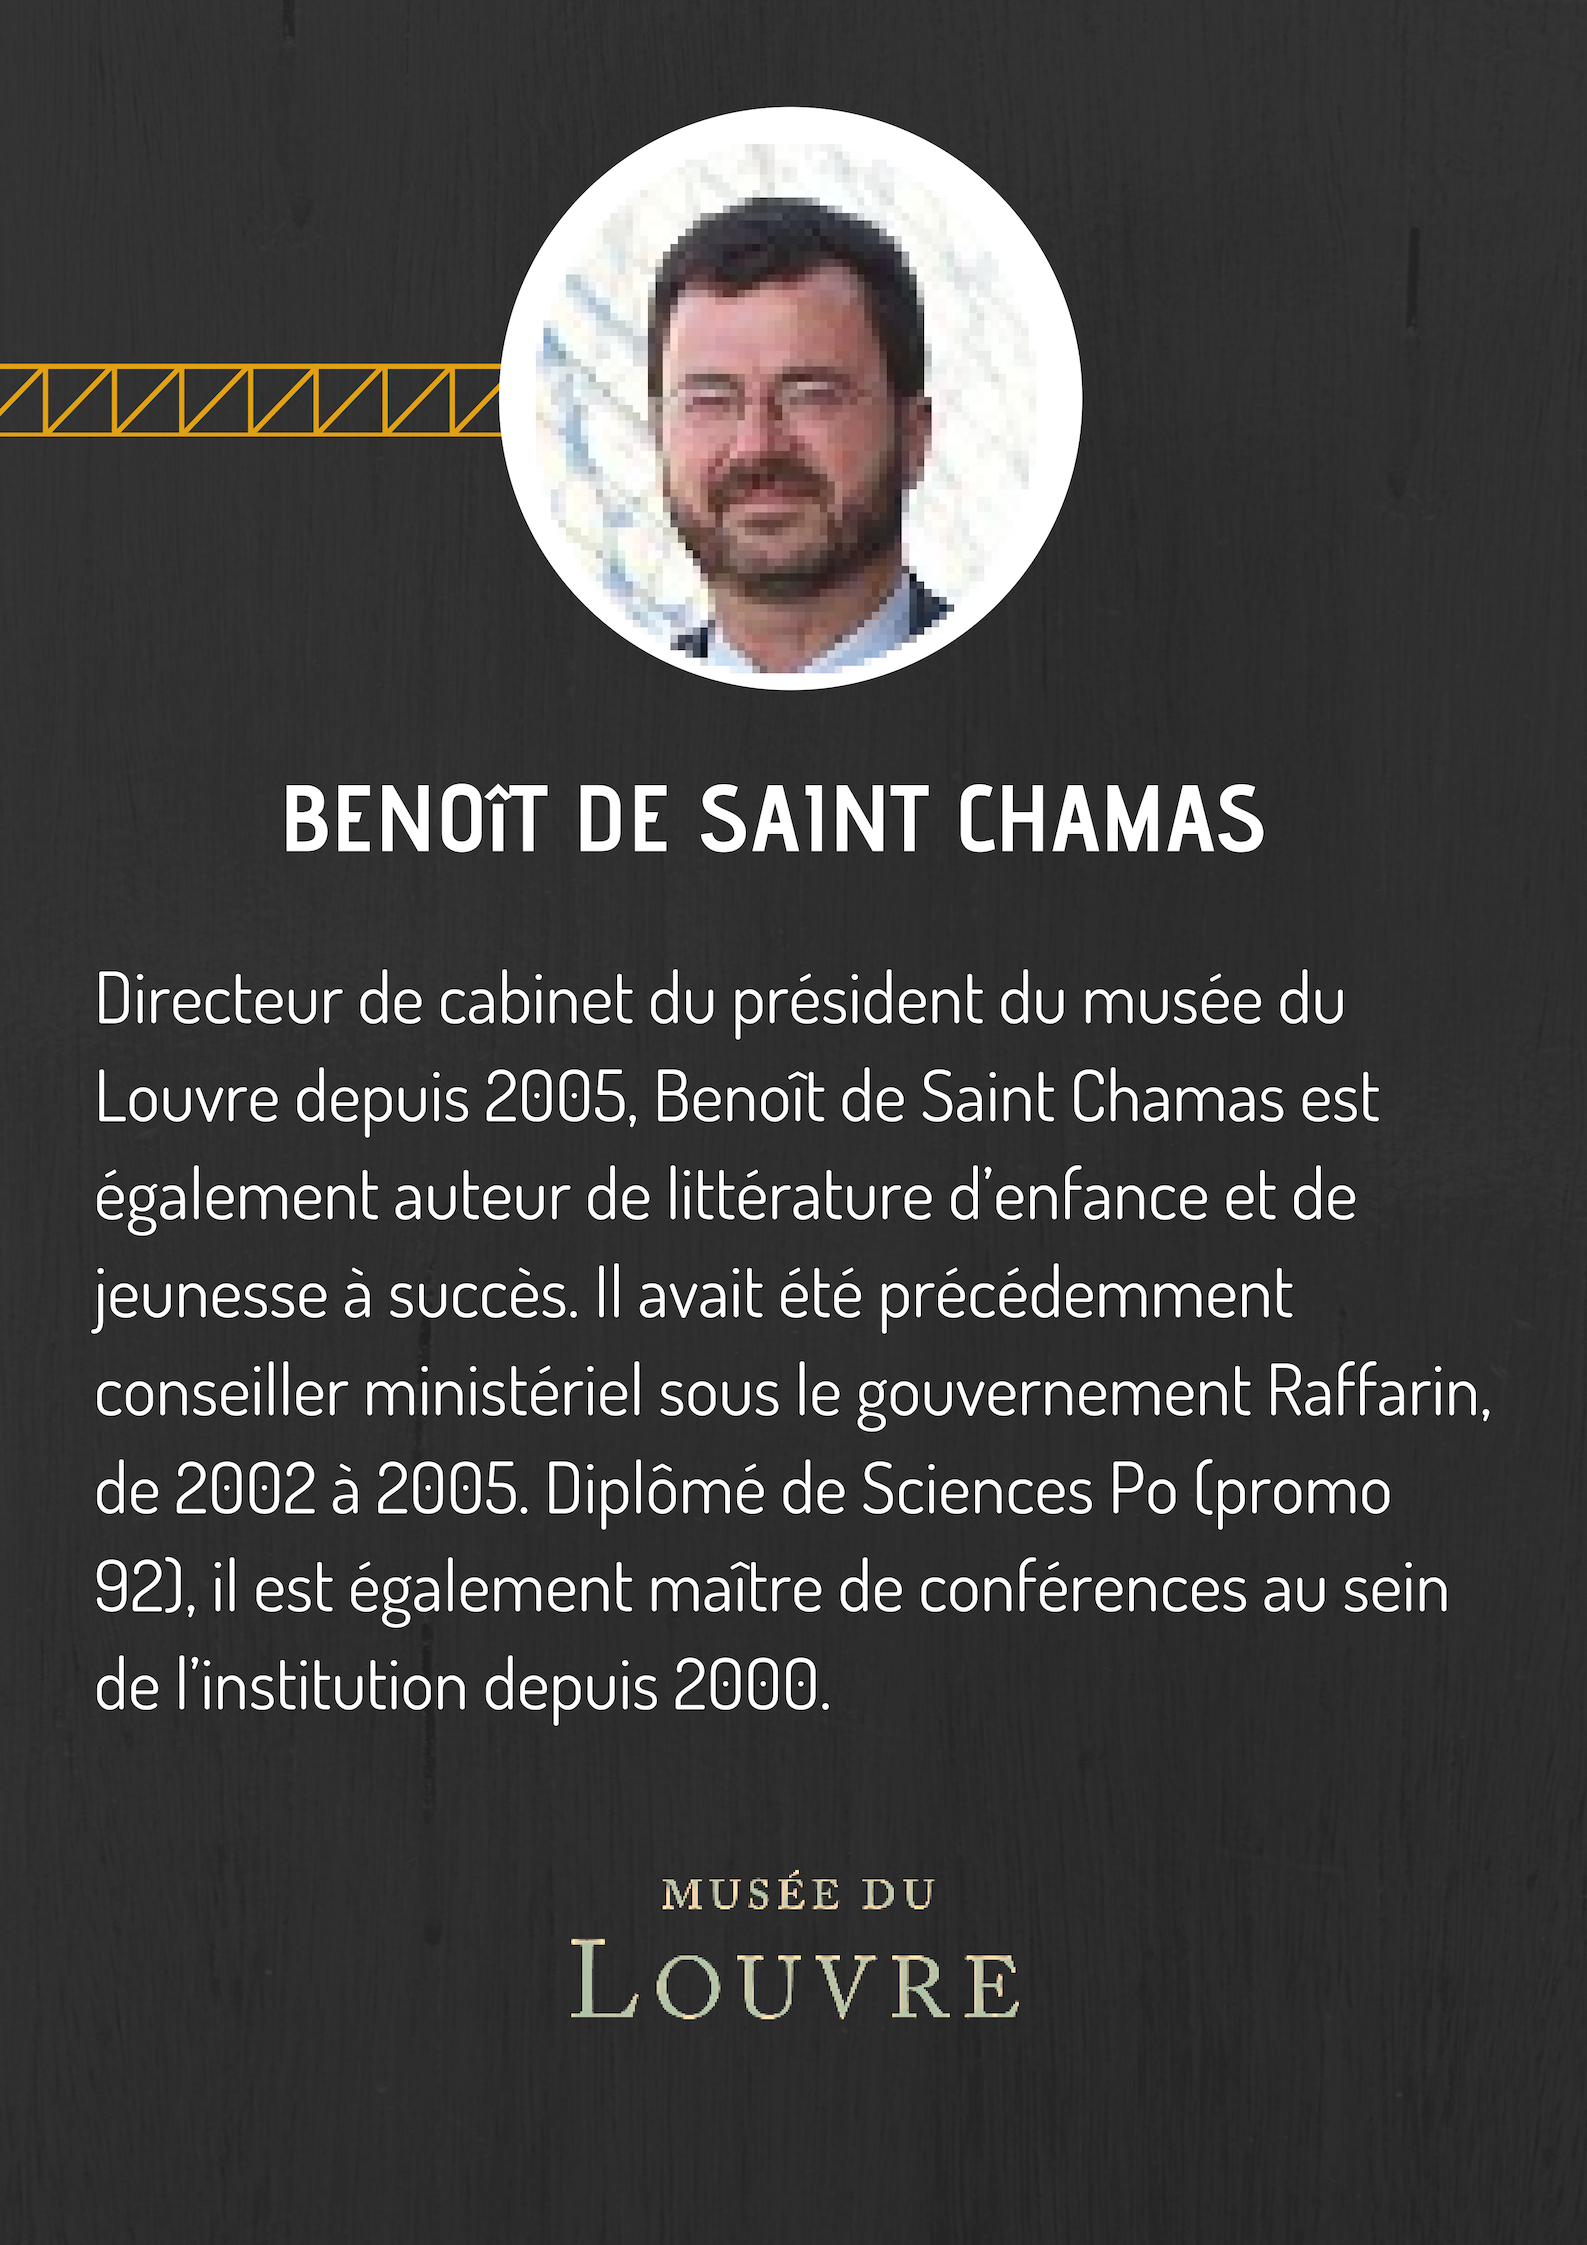 B de Saint Chamas